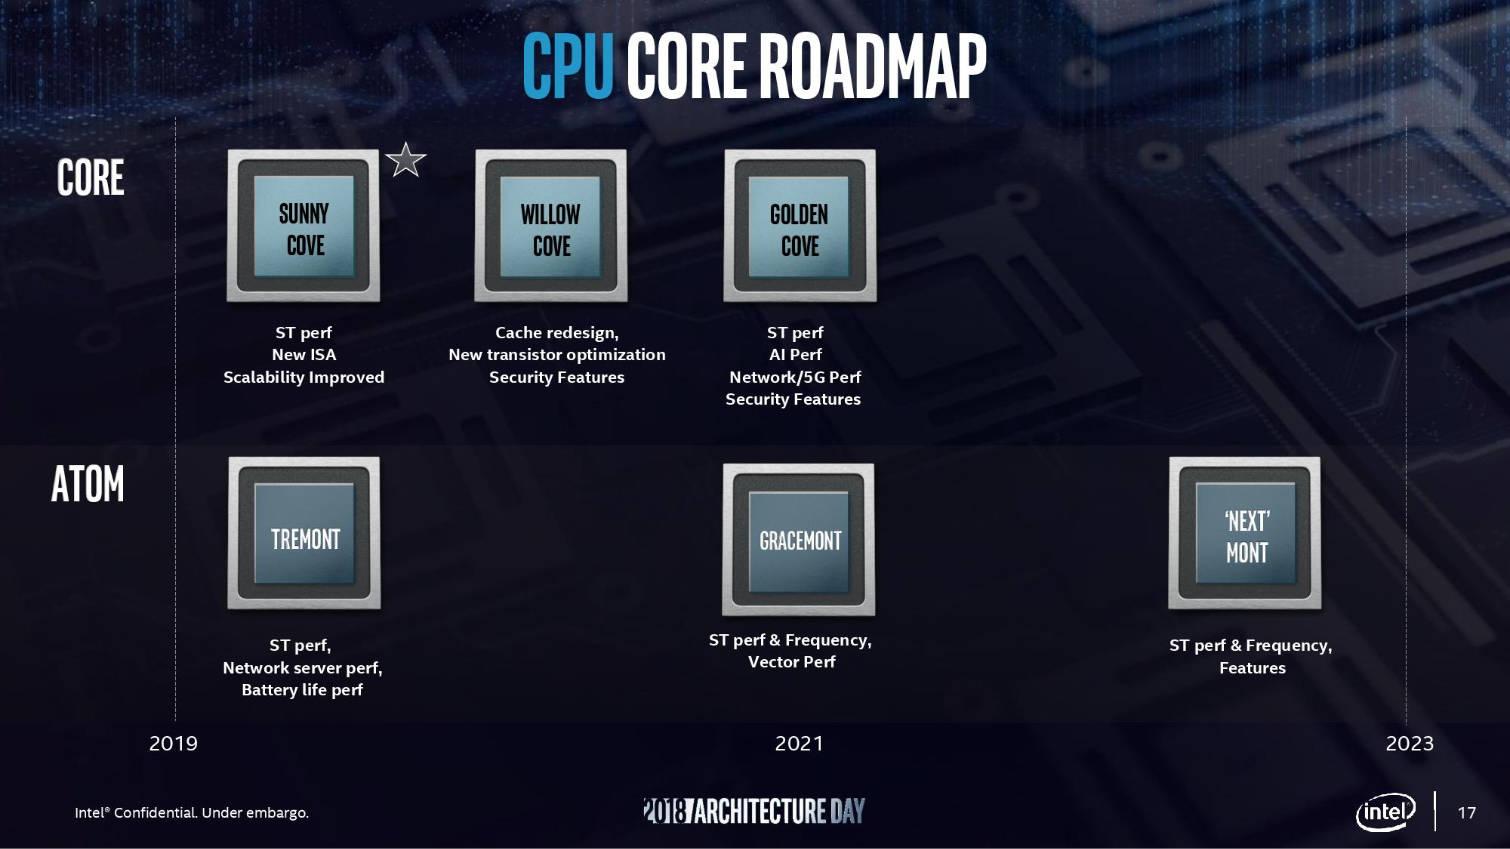 Intel CPU Core Roadmap Sunny Cove Willow Cove Golden Cove